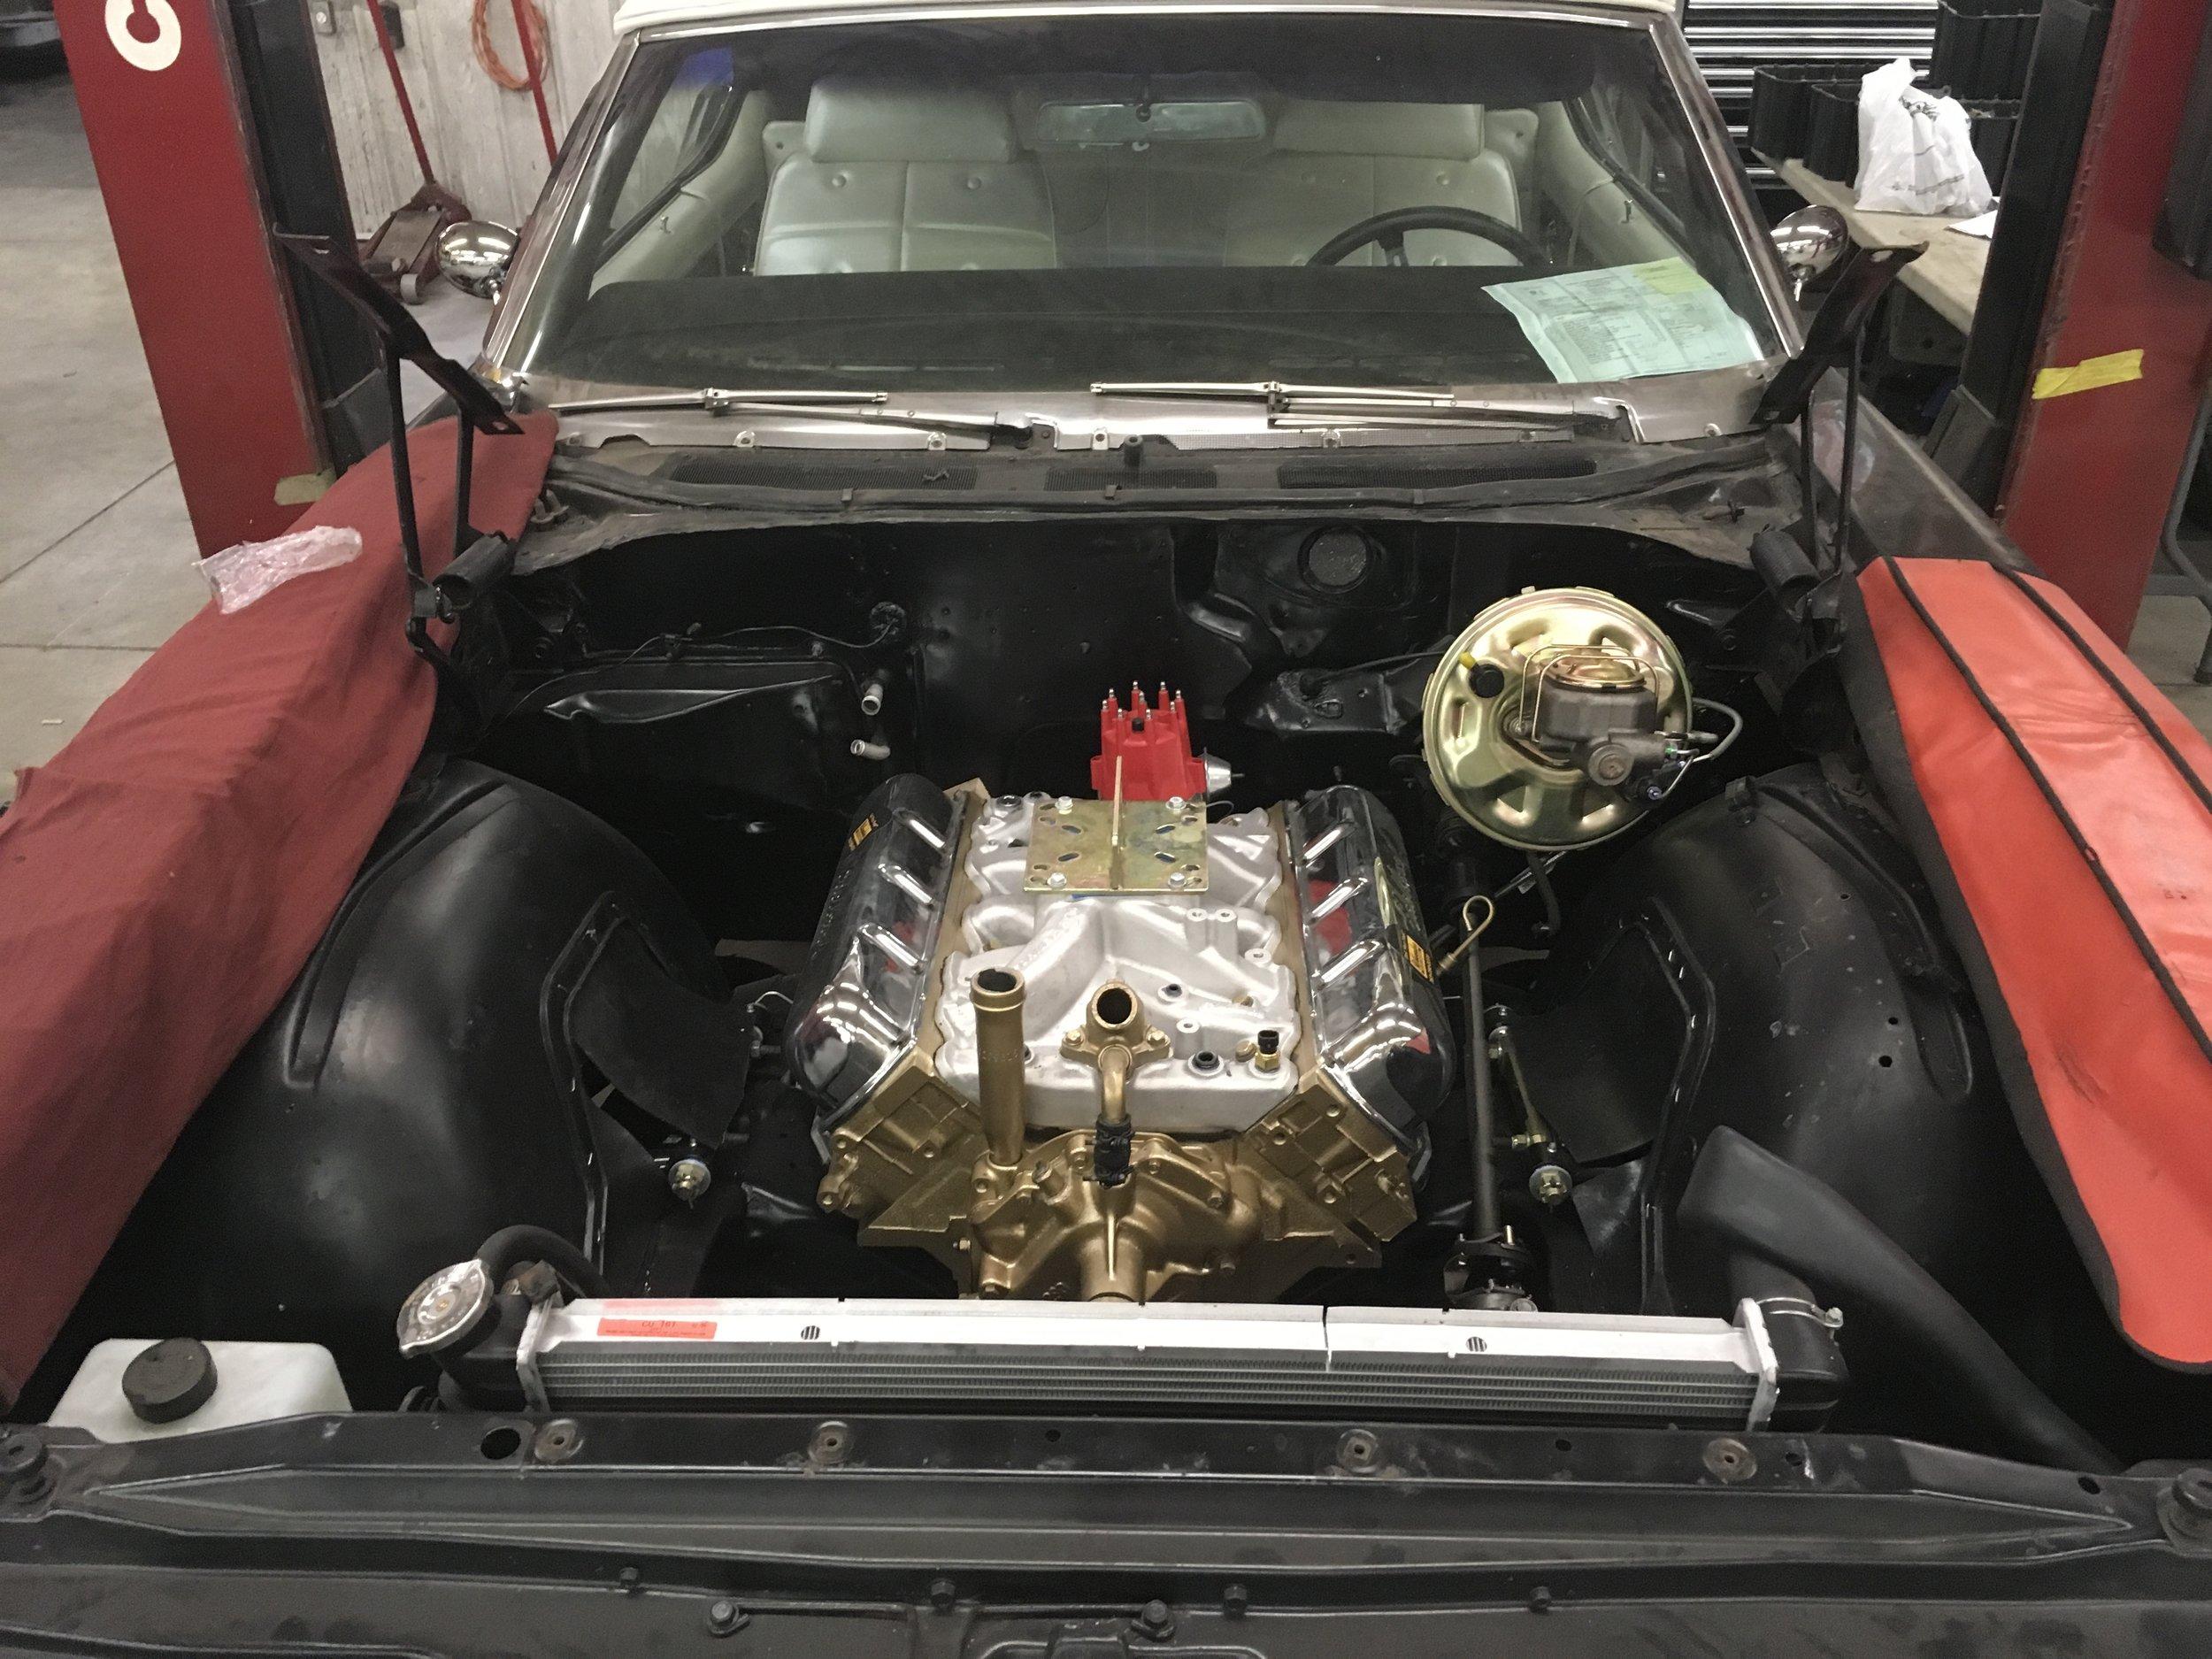 1970-oldsmobile-cutlass-minneapolis-custom-hot-rod-car-restoration-21.jpg